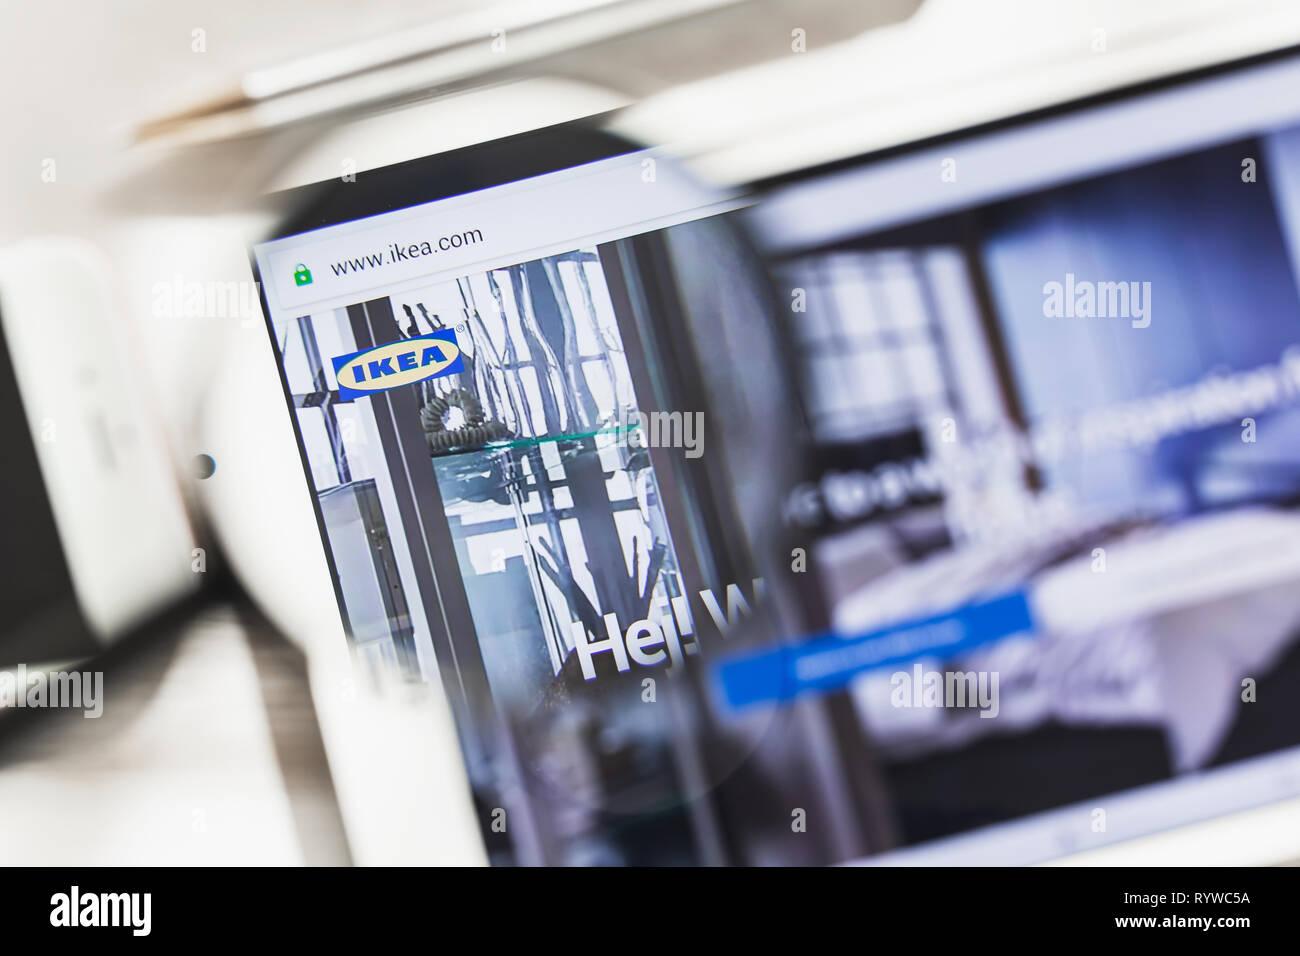 Sedili Wc Ikea : Ikea group immagini ikea group fotos stock alamy